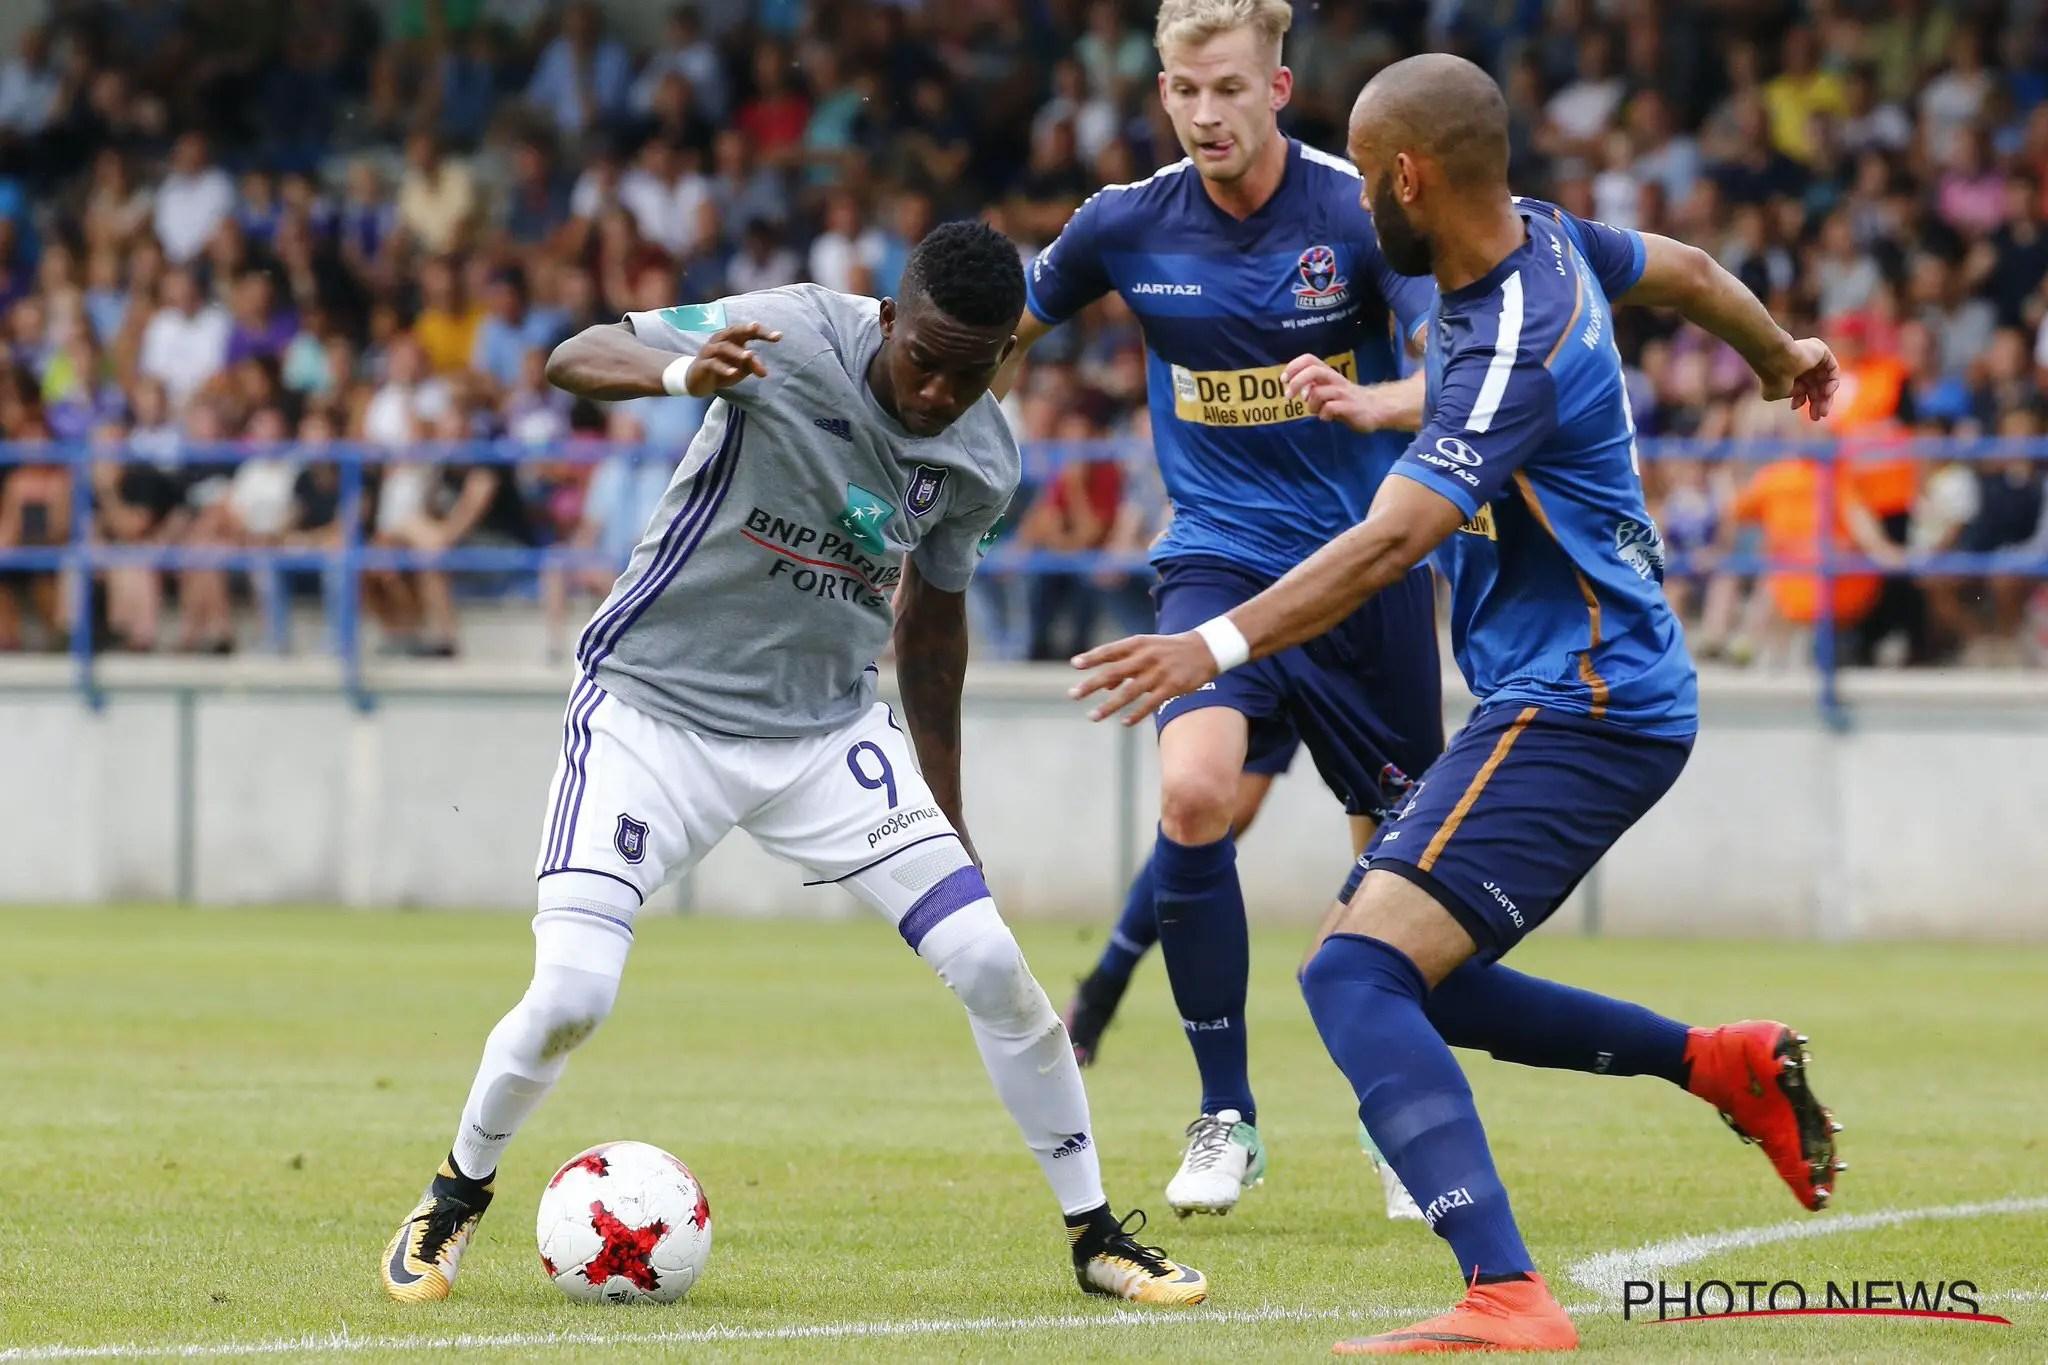 Henty, Adegbenro Score; Onyekuru, Awaziem Make Anderlecht, Nantes League Debuts